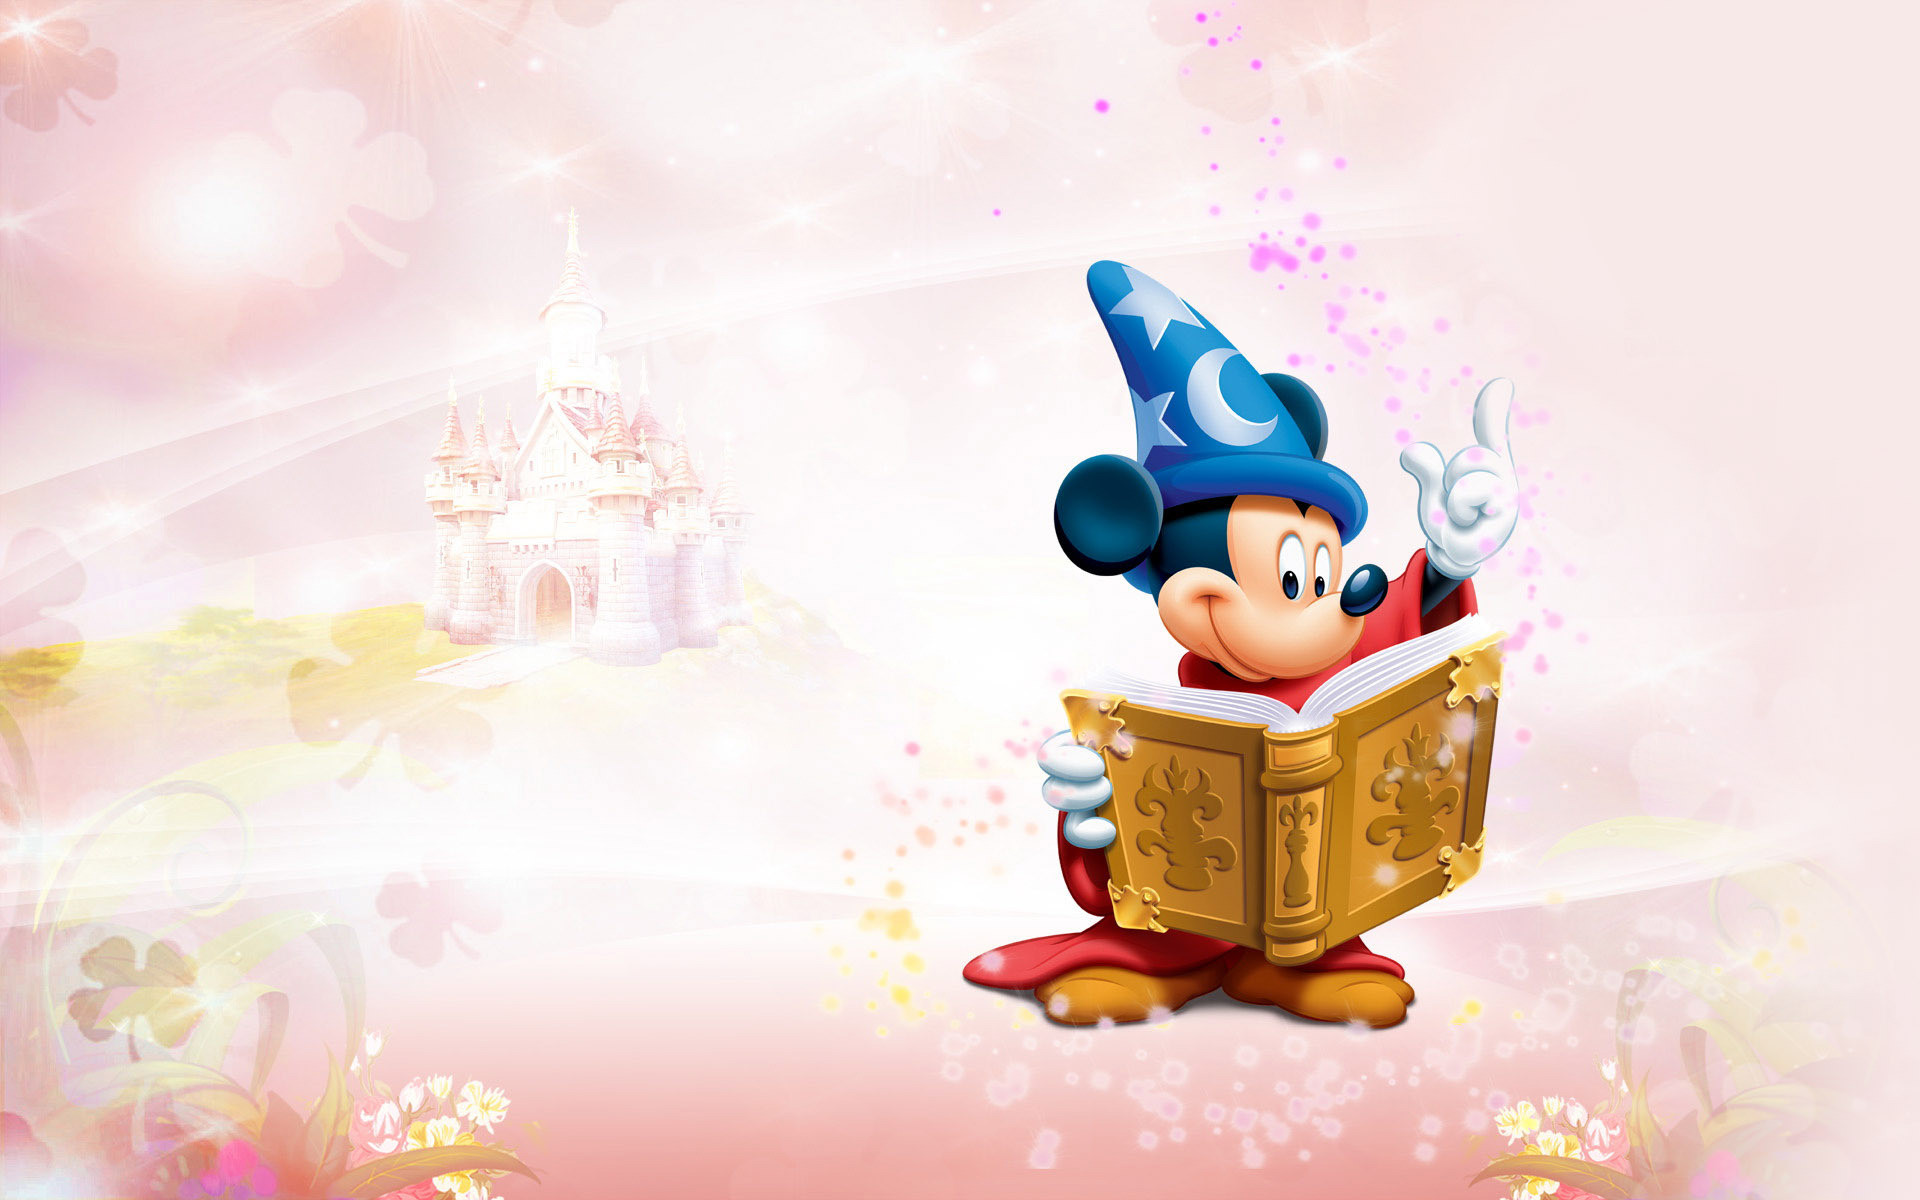 Magic Mickey Mouse Wallpaper.